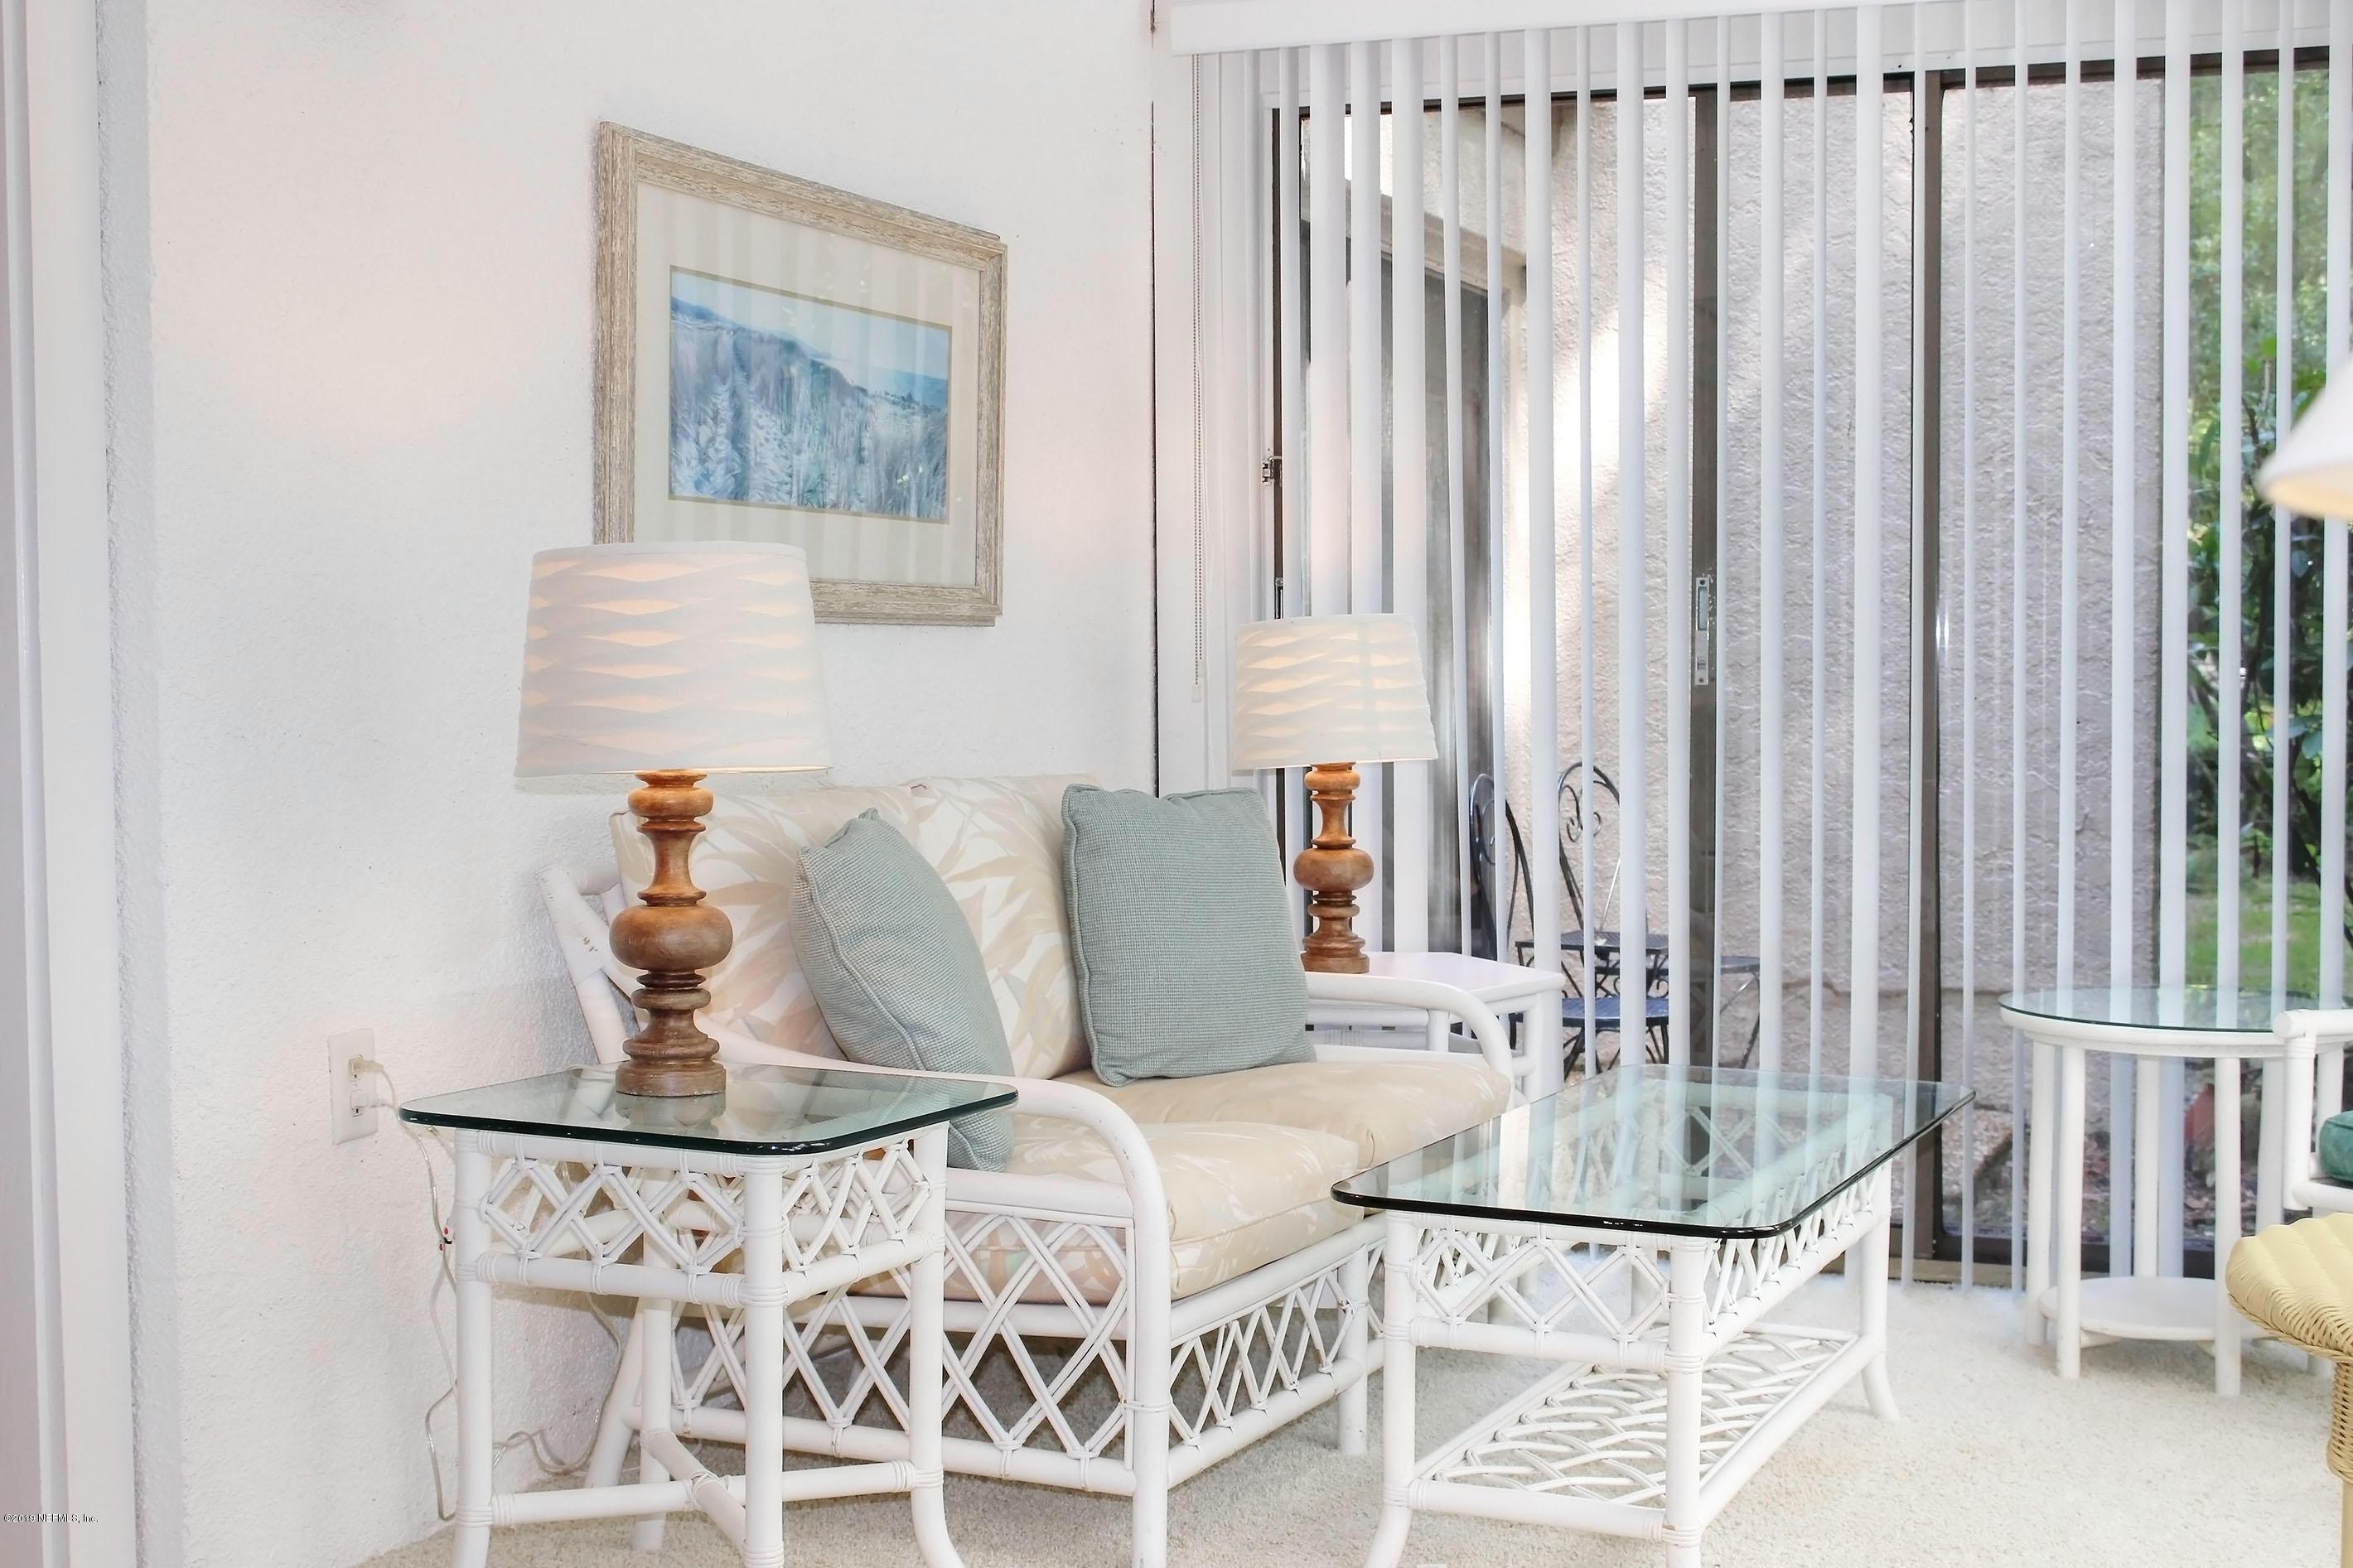 3210 SEA MARSH, FERNANDINA BEACH, FLORIDA 32034, 2 Bedrooms Bedrooms, ,2 BathroomsBathrooms,Residential,For sale,SEA MARSH,1082253